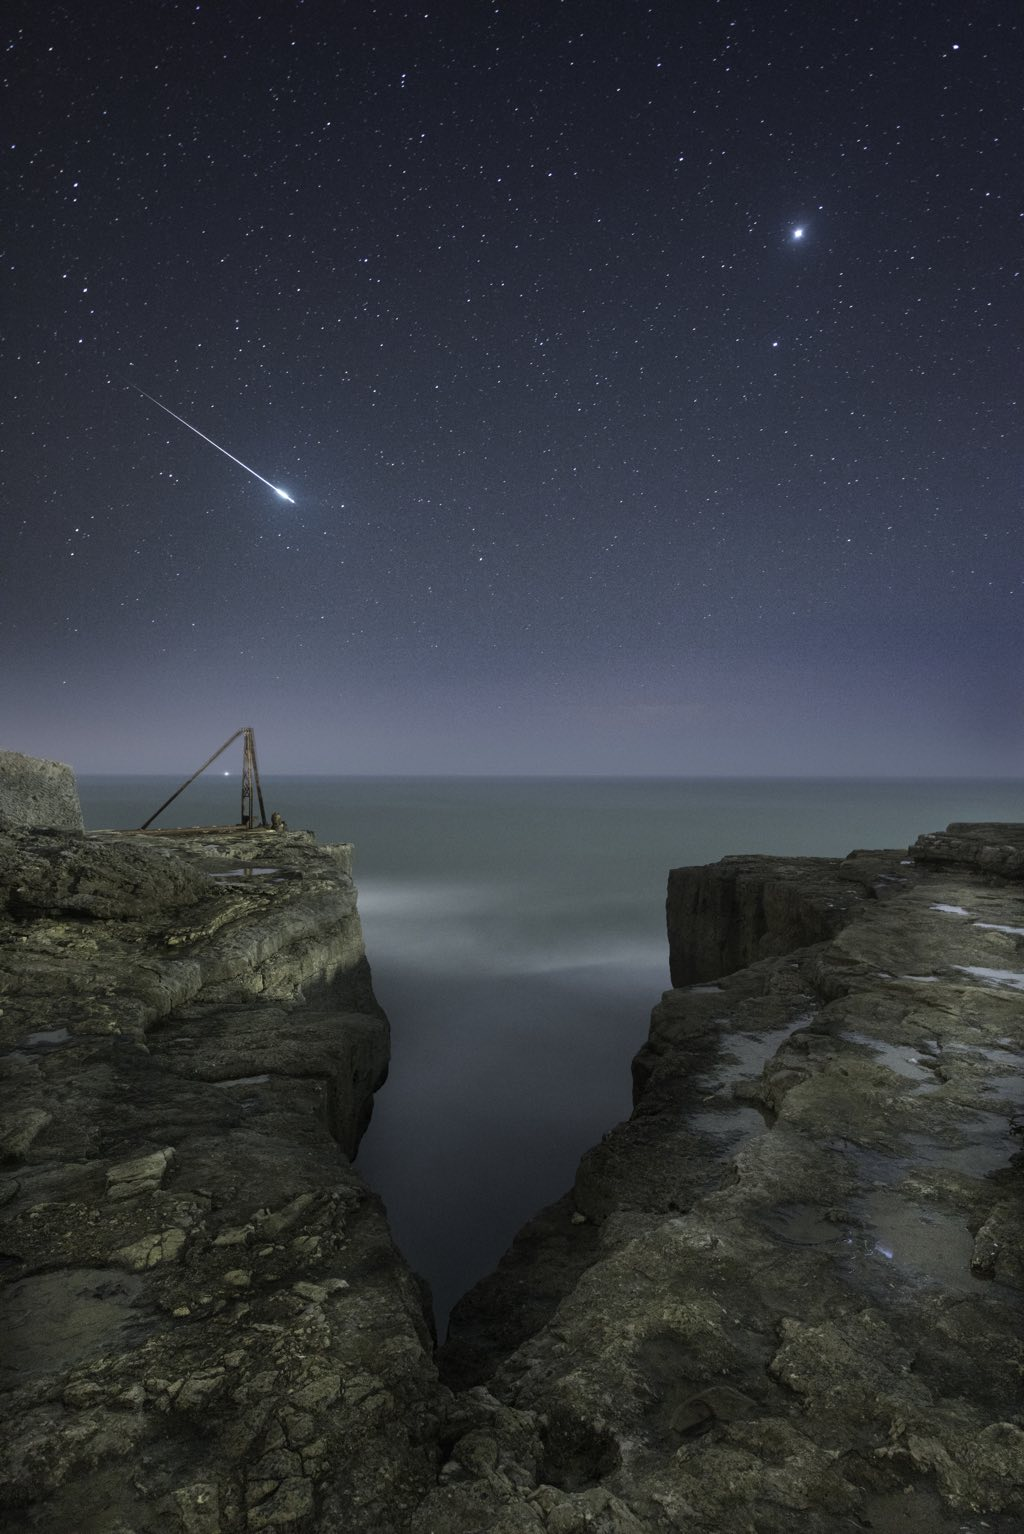 Shooting Star and Jupiter © Rob Bowes